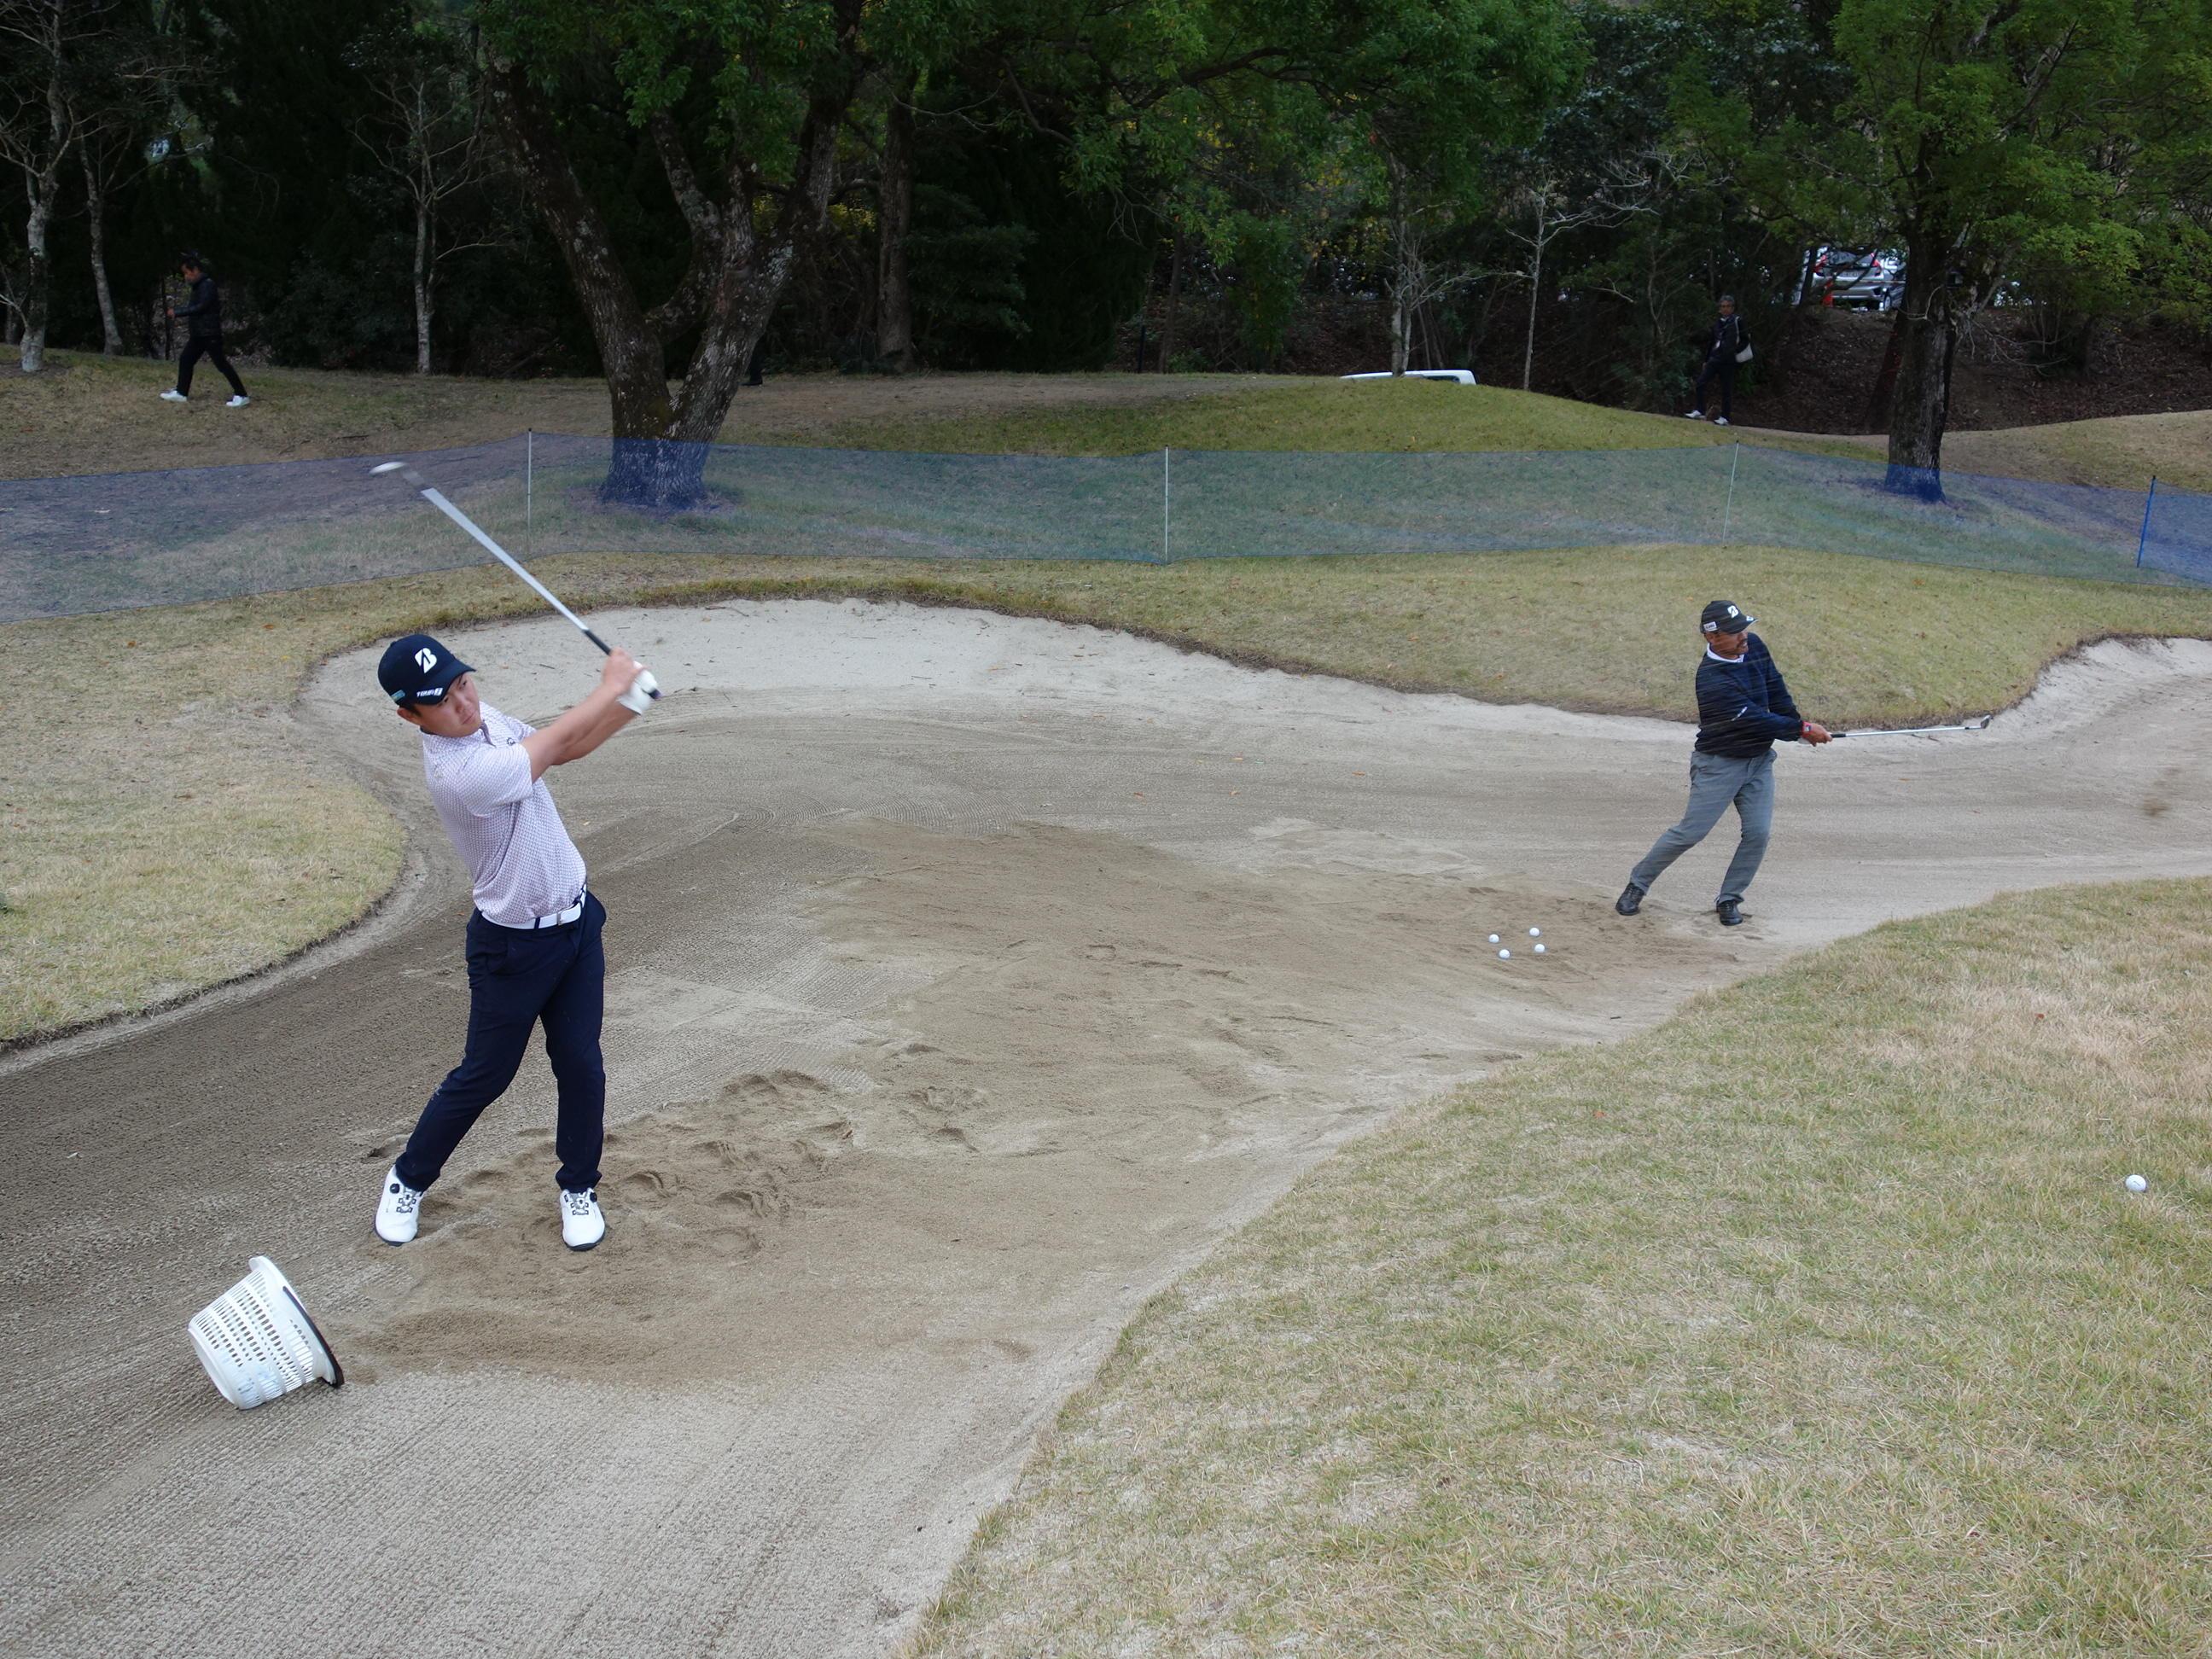 https://www.bs-golf.com/pro/a7bcc7092f76a7d3146e1009f67353ed6402861a.JPG